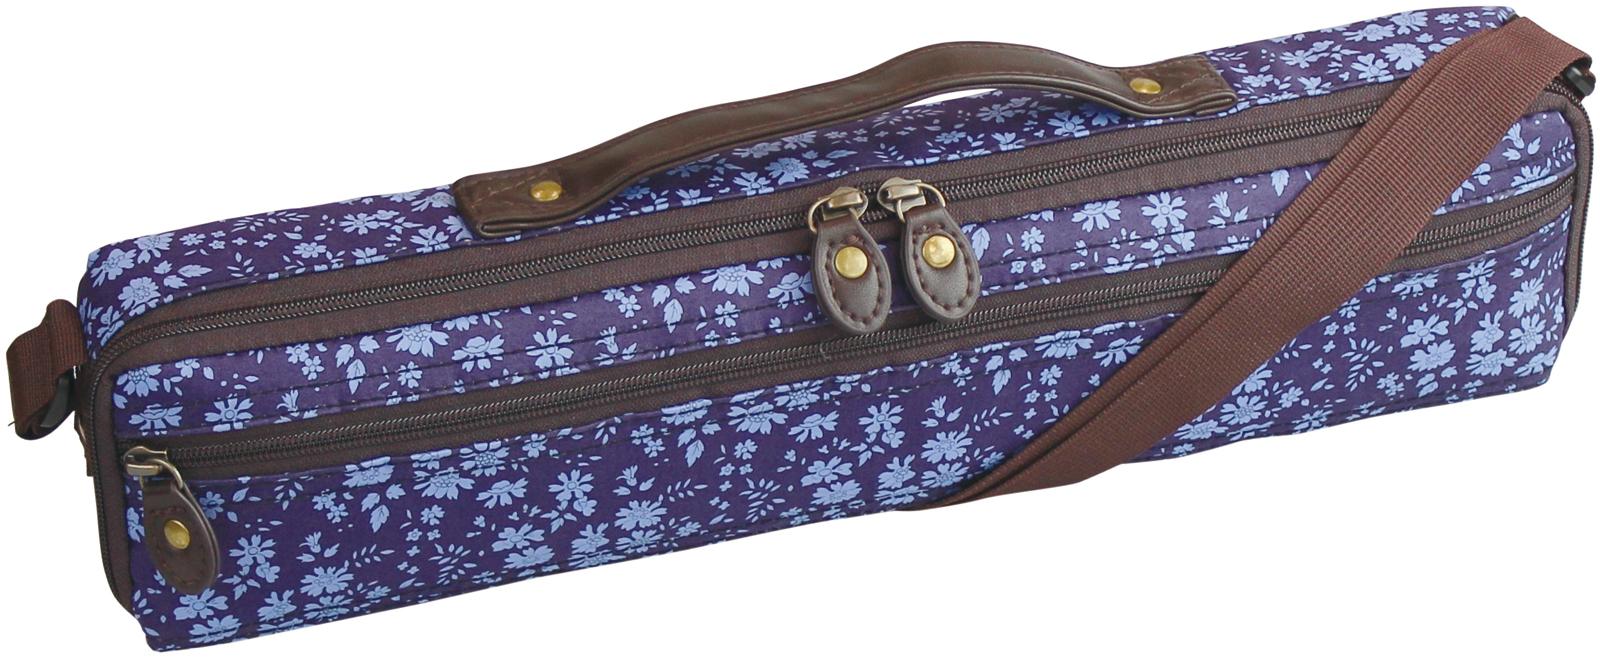 Pearl Flute ( パールフルート ) PSC-LFCC28 カペル フルートケース リバティプリント C足部管 ケースカバー ハードケース用 花柄 ブルー ショルダー flute case フルート用